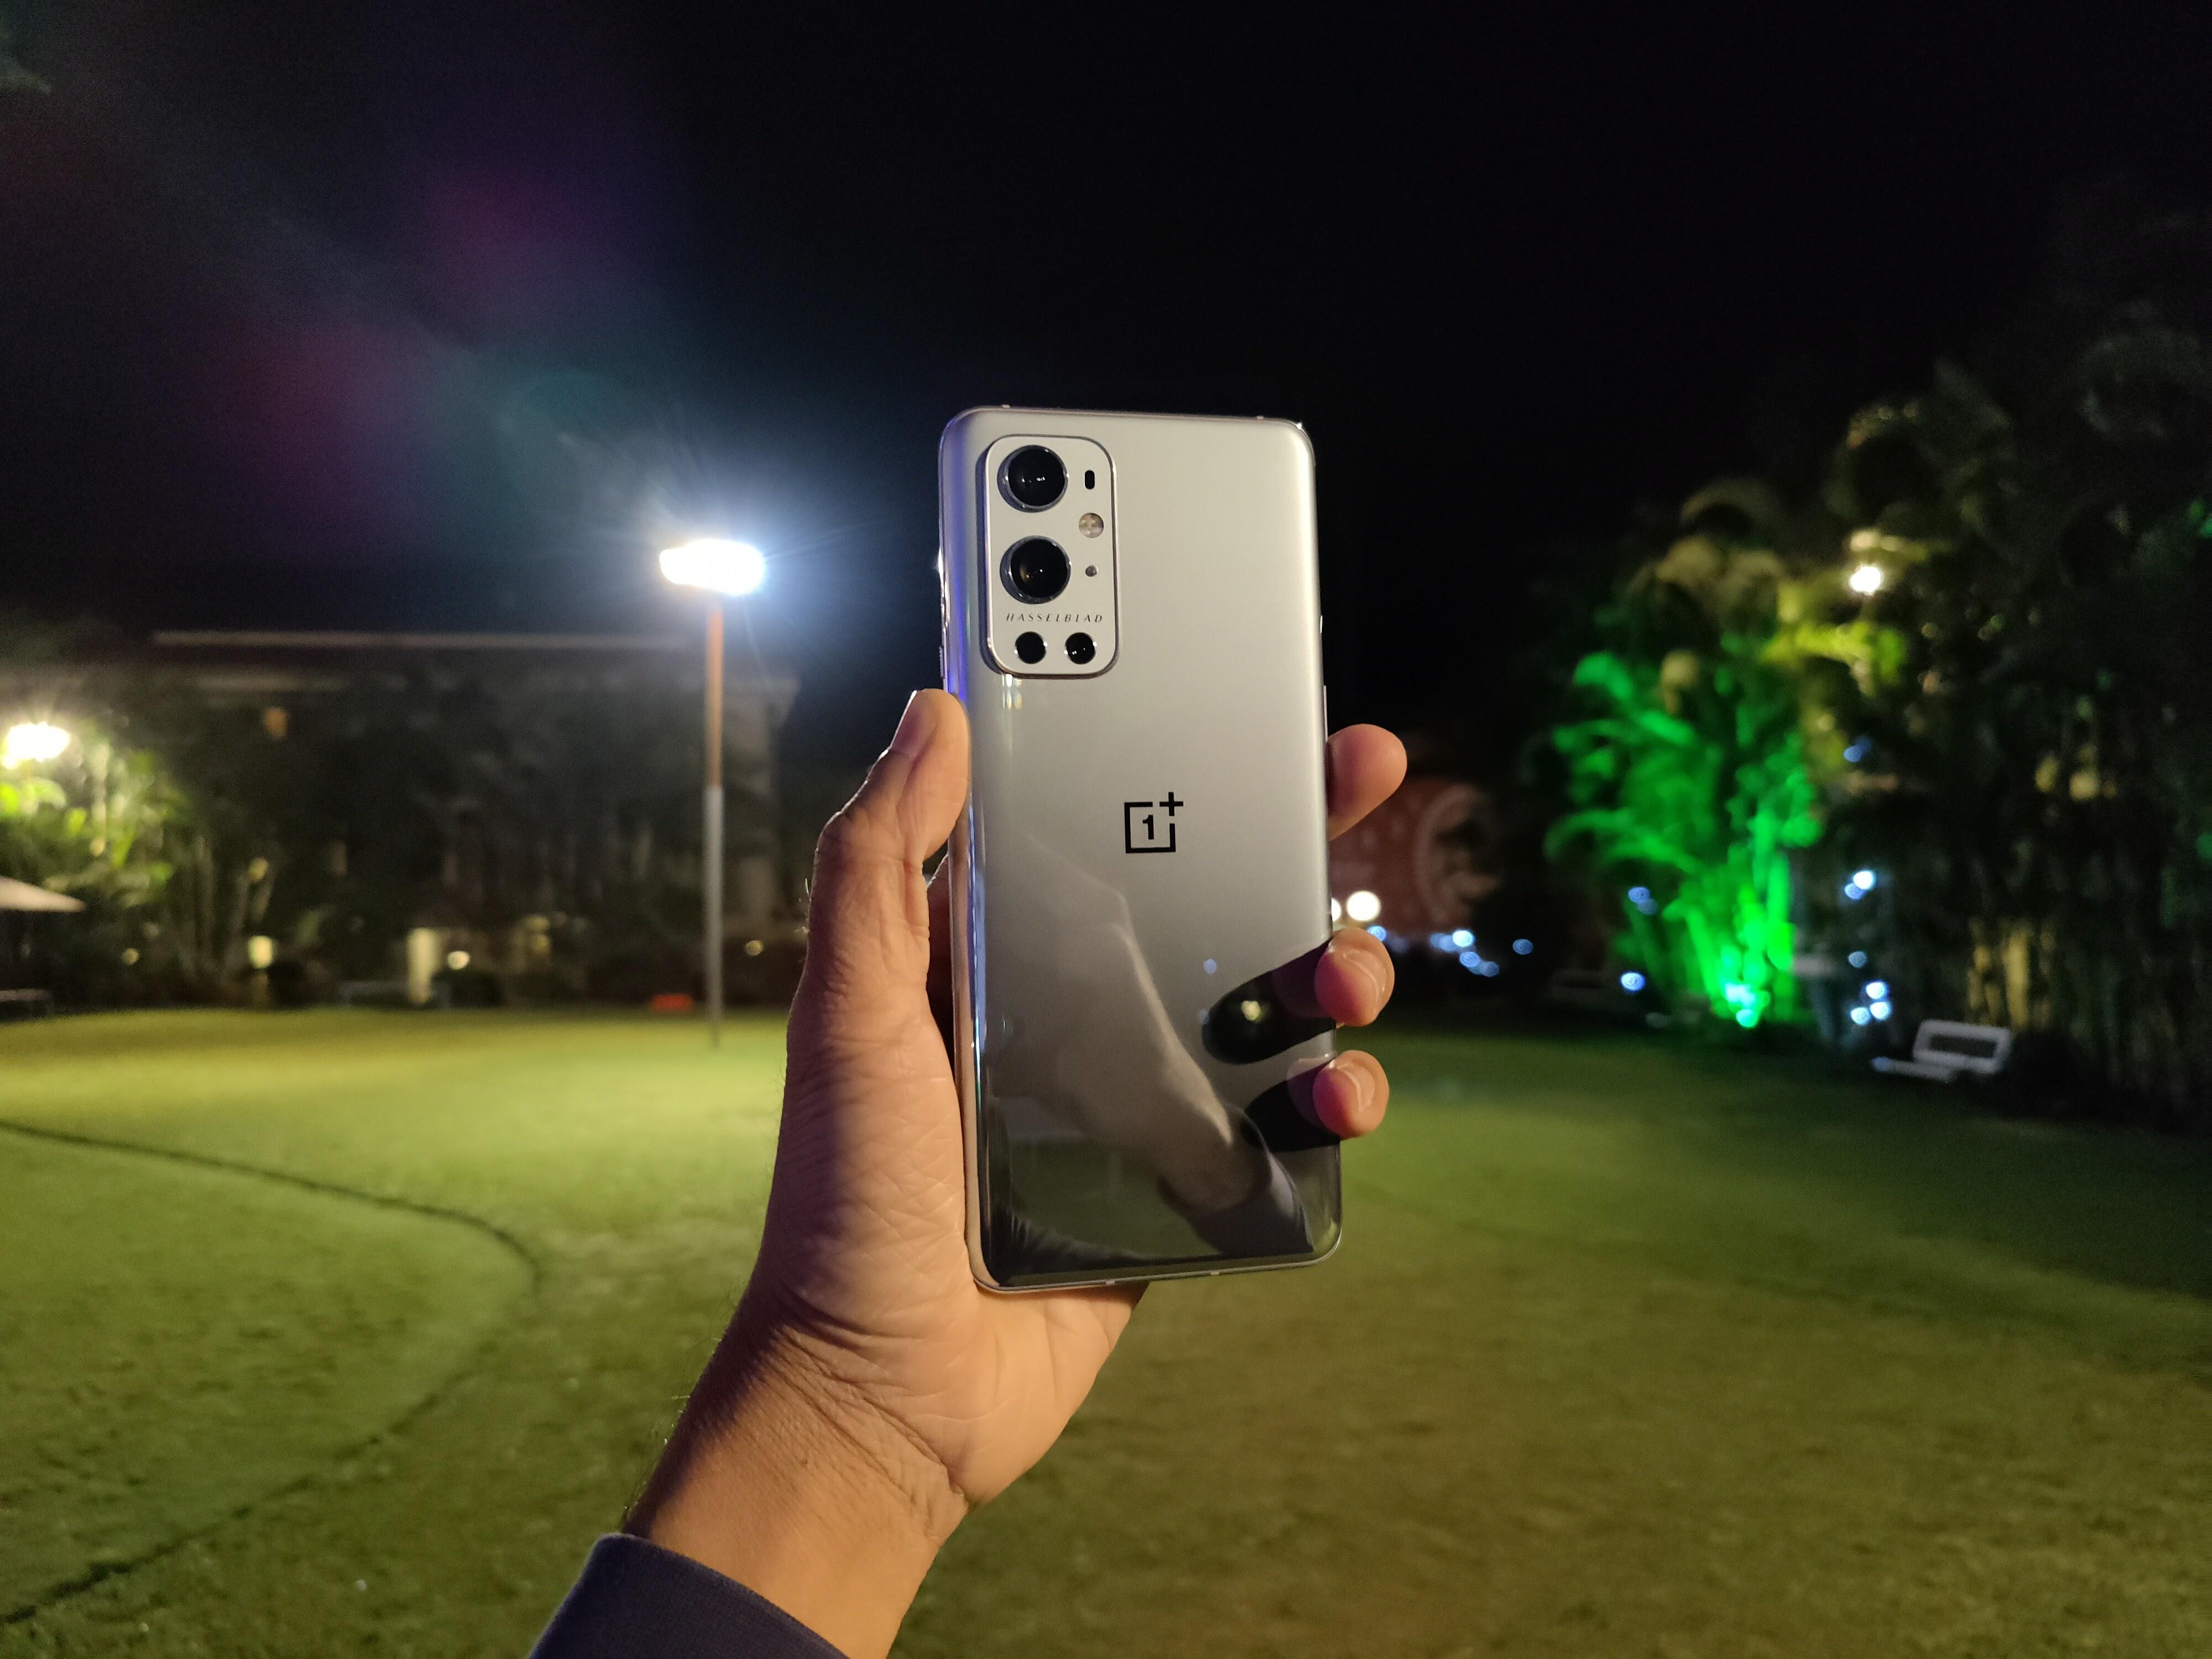 OnePlus 9 samples